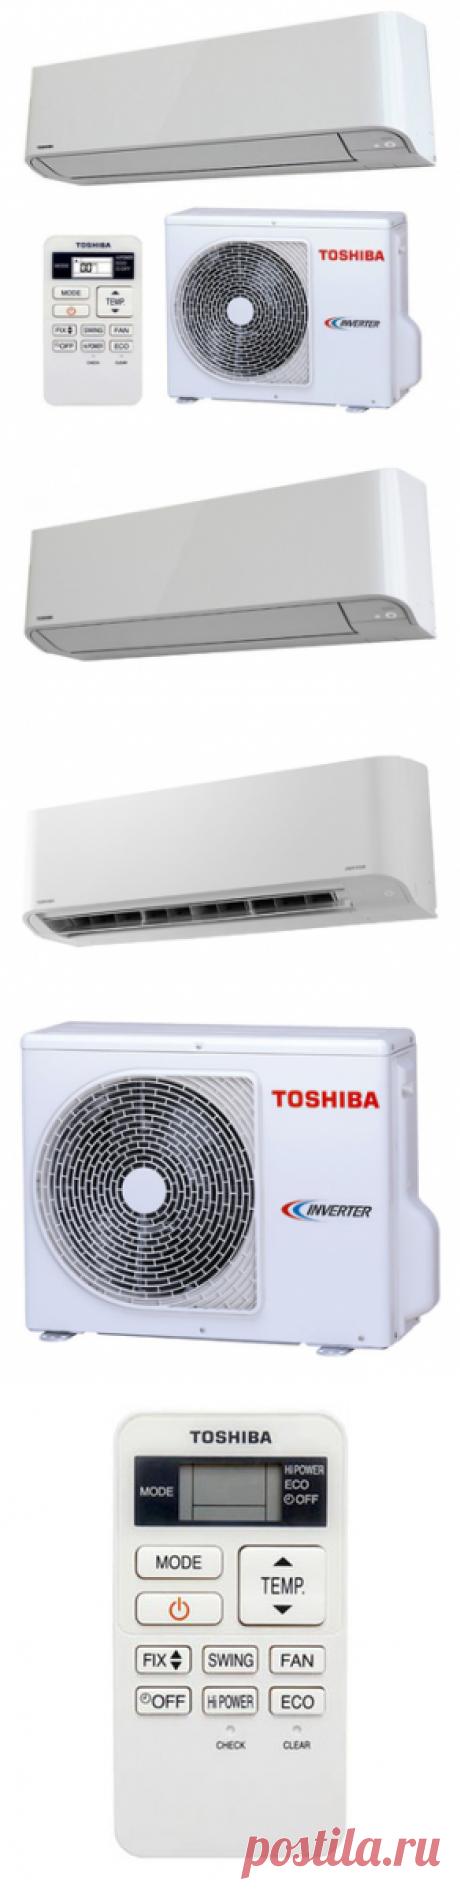 Сплит-система Toshiba RAS-05BKV-E / RAS-05BAV-E инвертор (артикул: Т-202932) в Москве